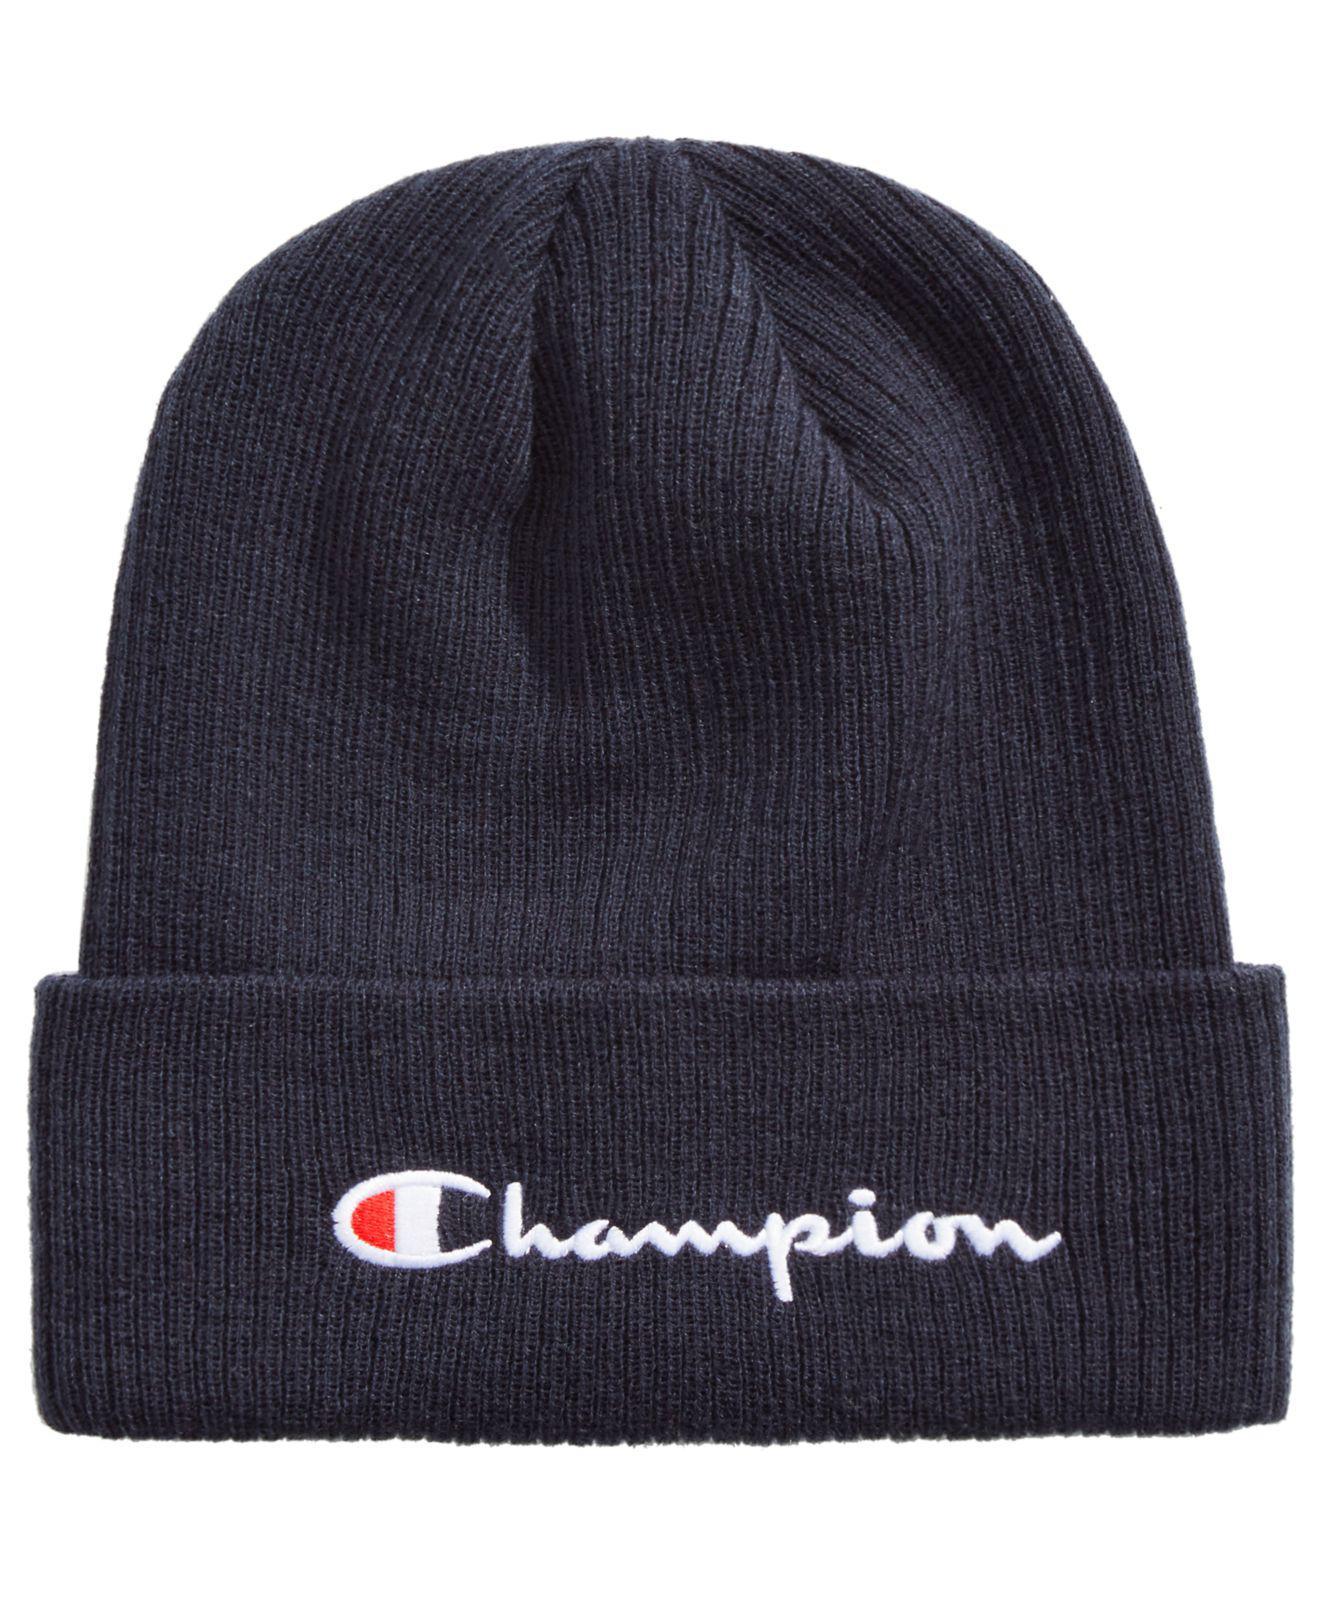 91108260a44ef Champion - Blue Cuffed Ribbed-knit Beanie for Men - Lyst. View fullscreen